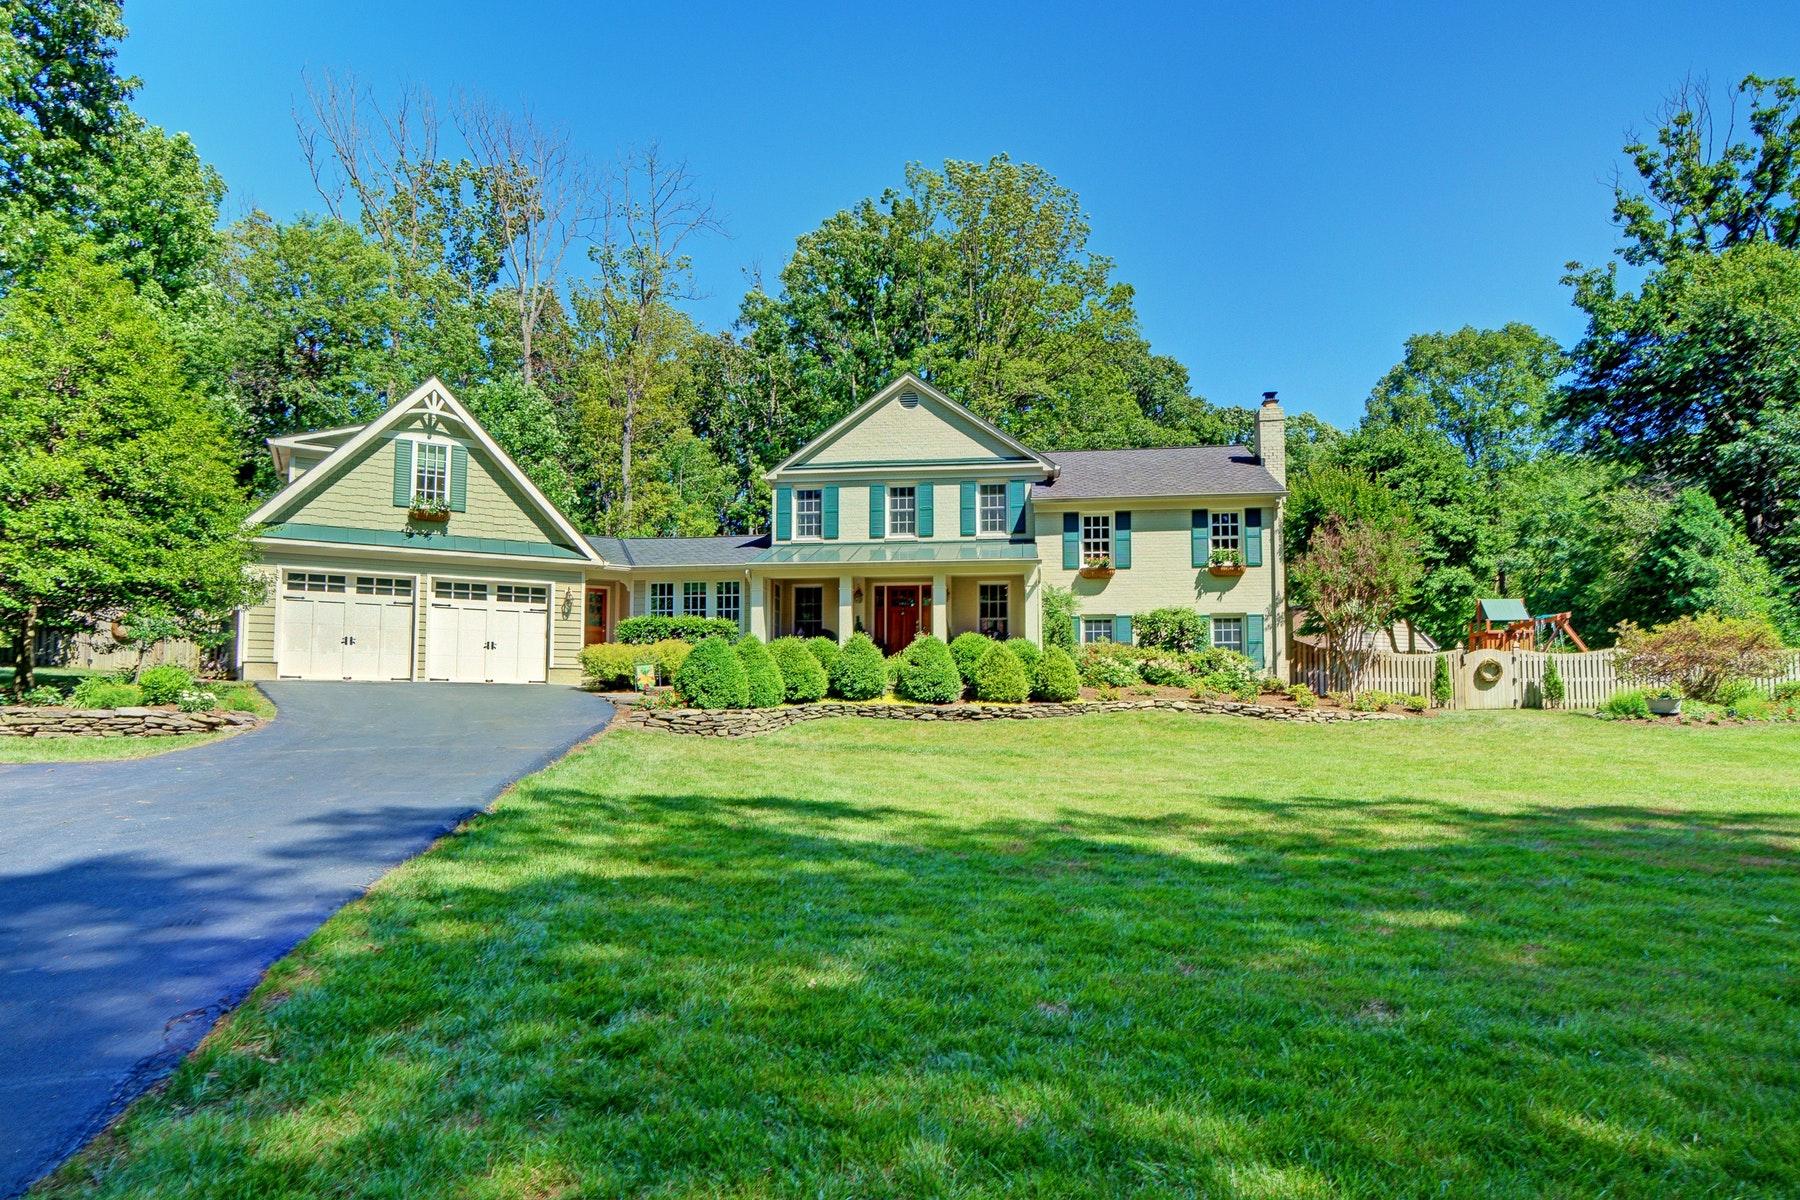 Single Family Homes for Active at Foxvale 11809 Wayland St Oakton, Virginia 22124 United States